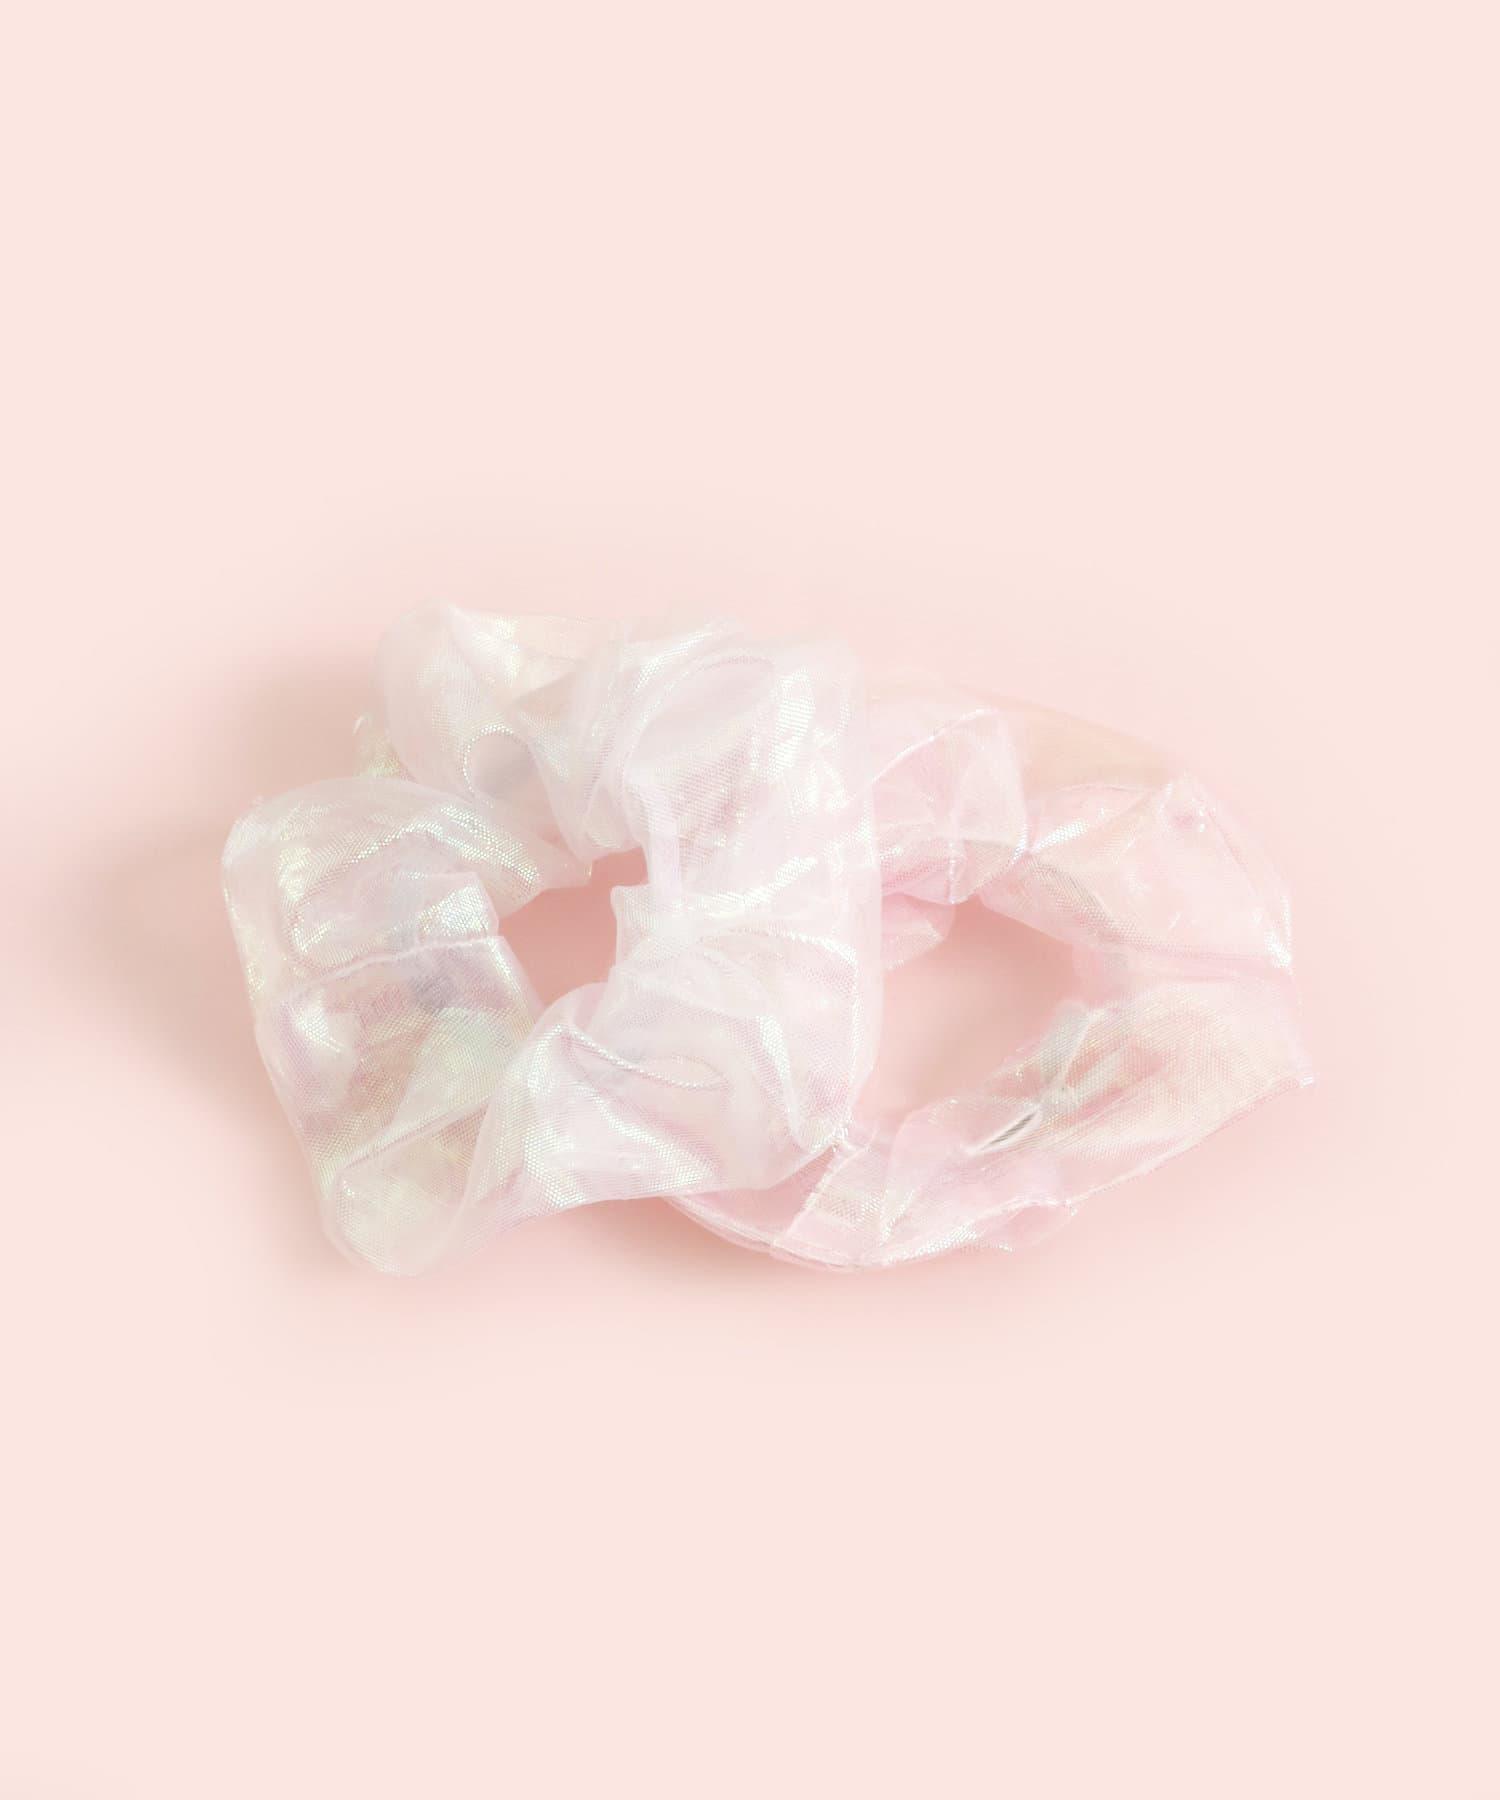 3COINS(スリーコインズ) 【ASOKO】オーロラシュシュ2個セット